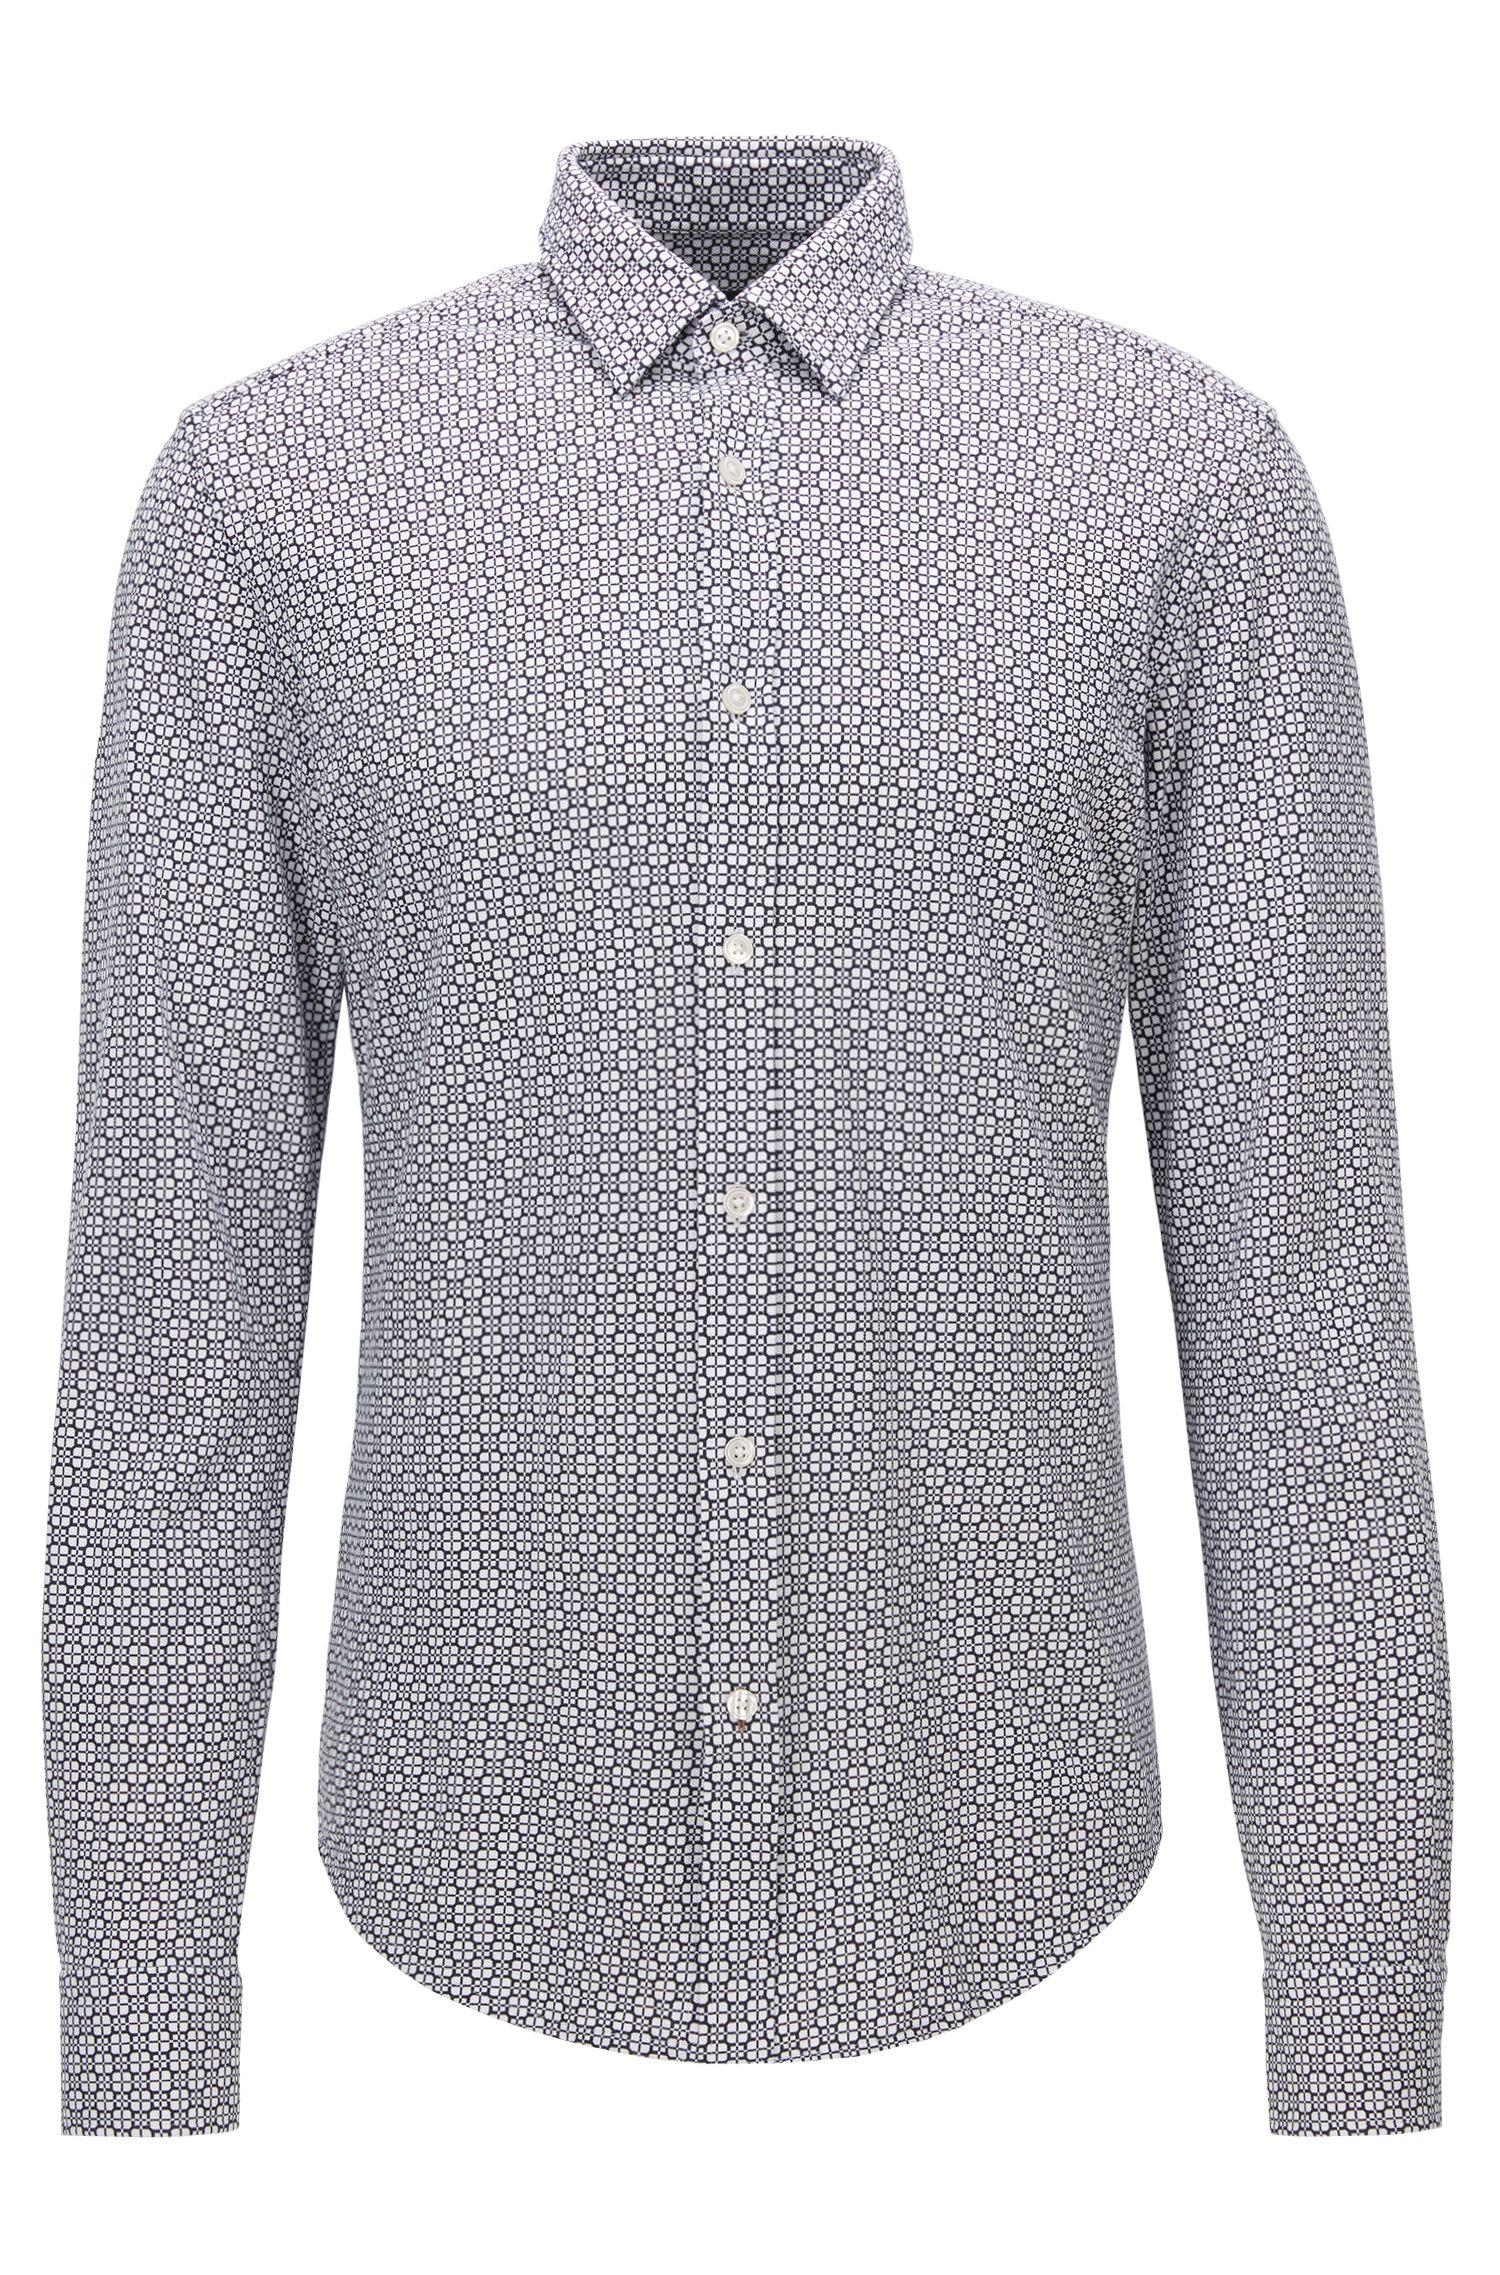 Square-Print Cotton Button Down Shirt, Slim Fit | Ronni